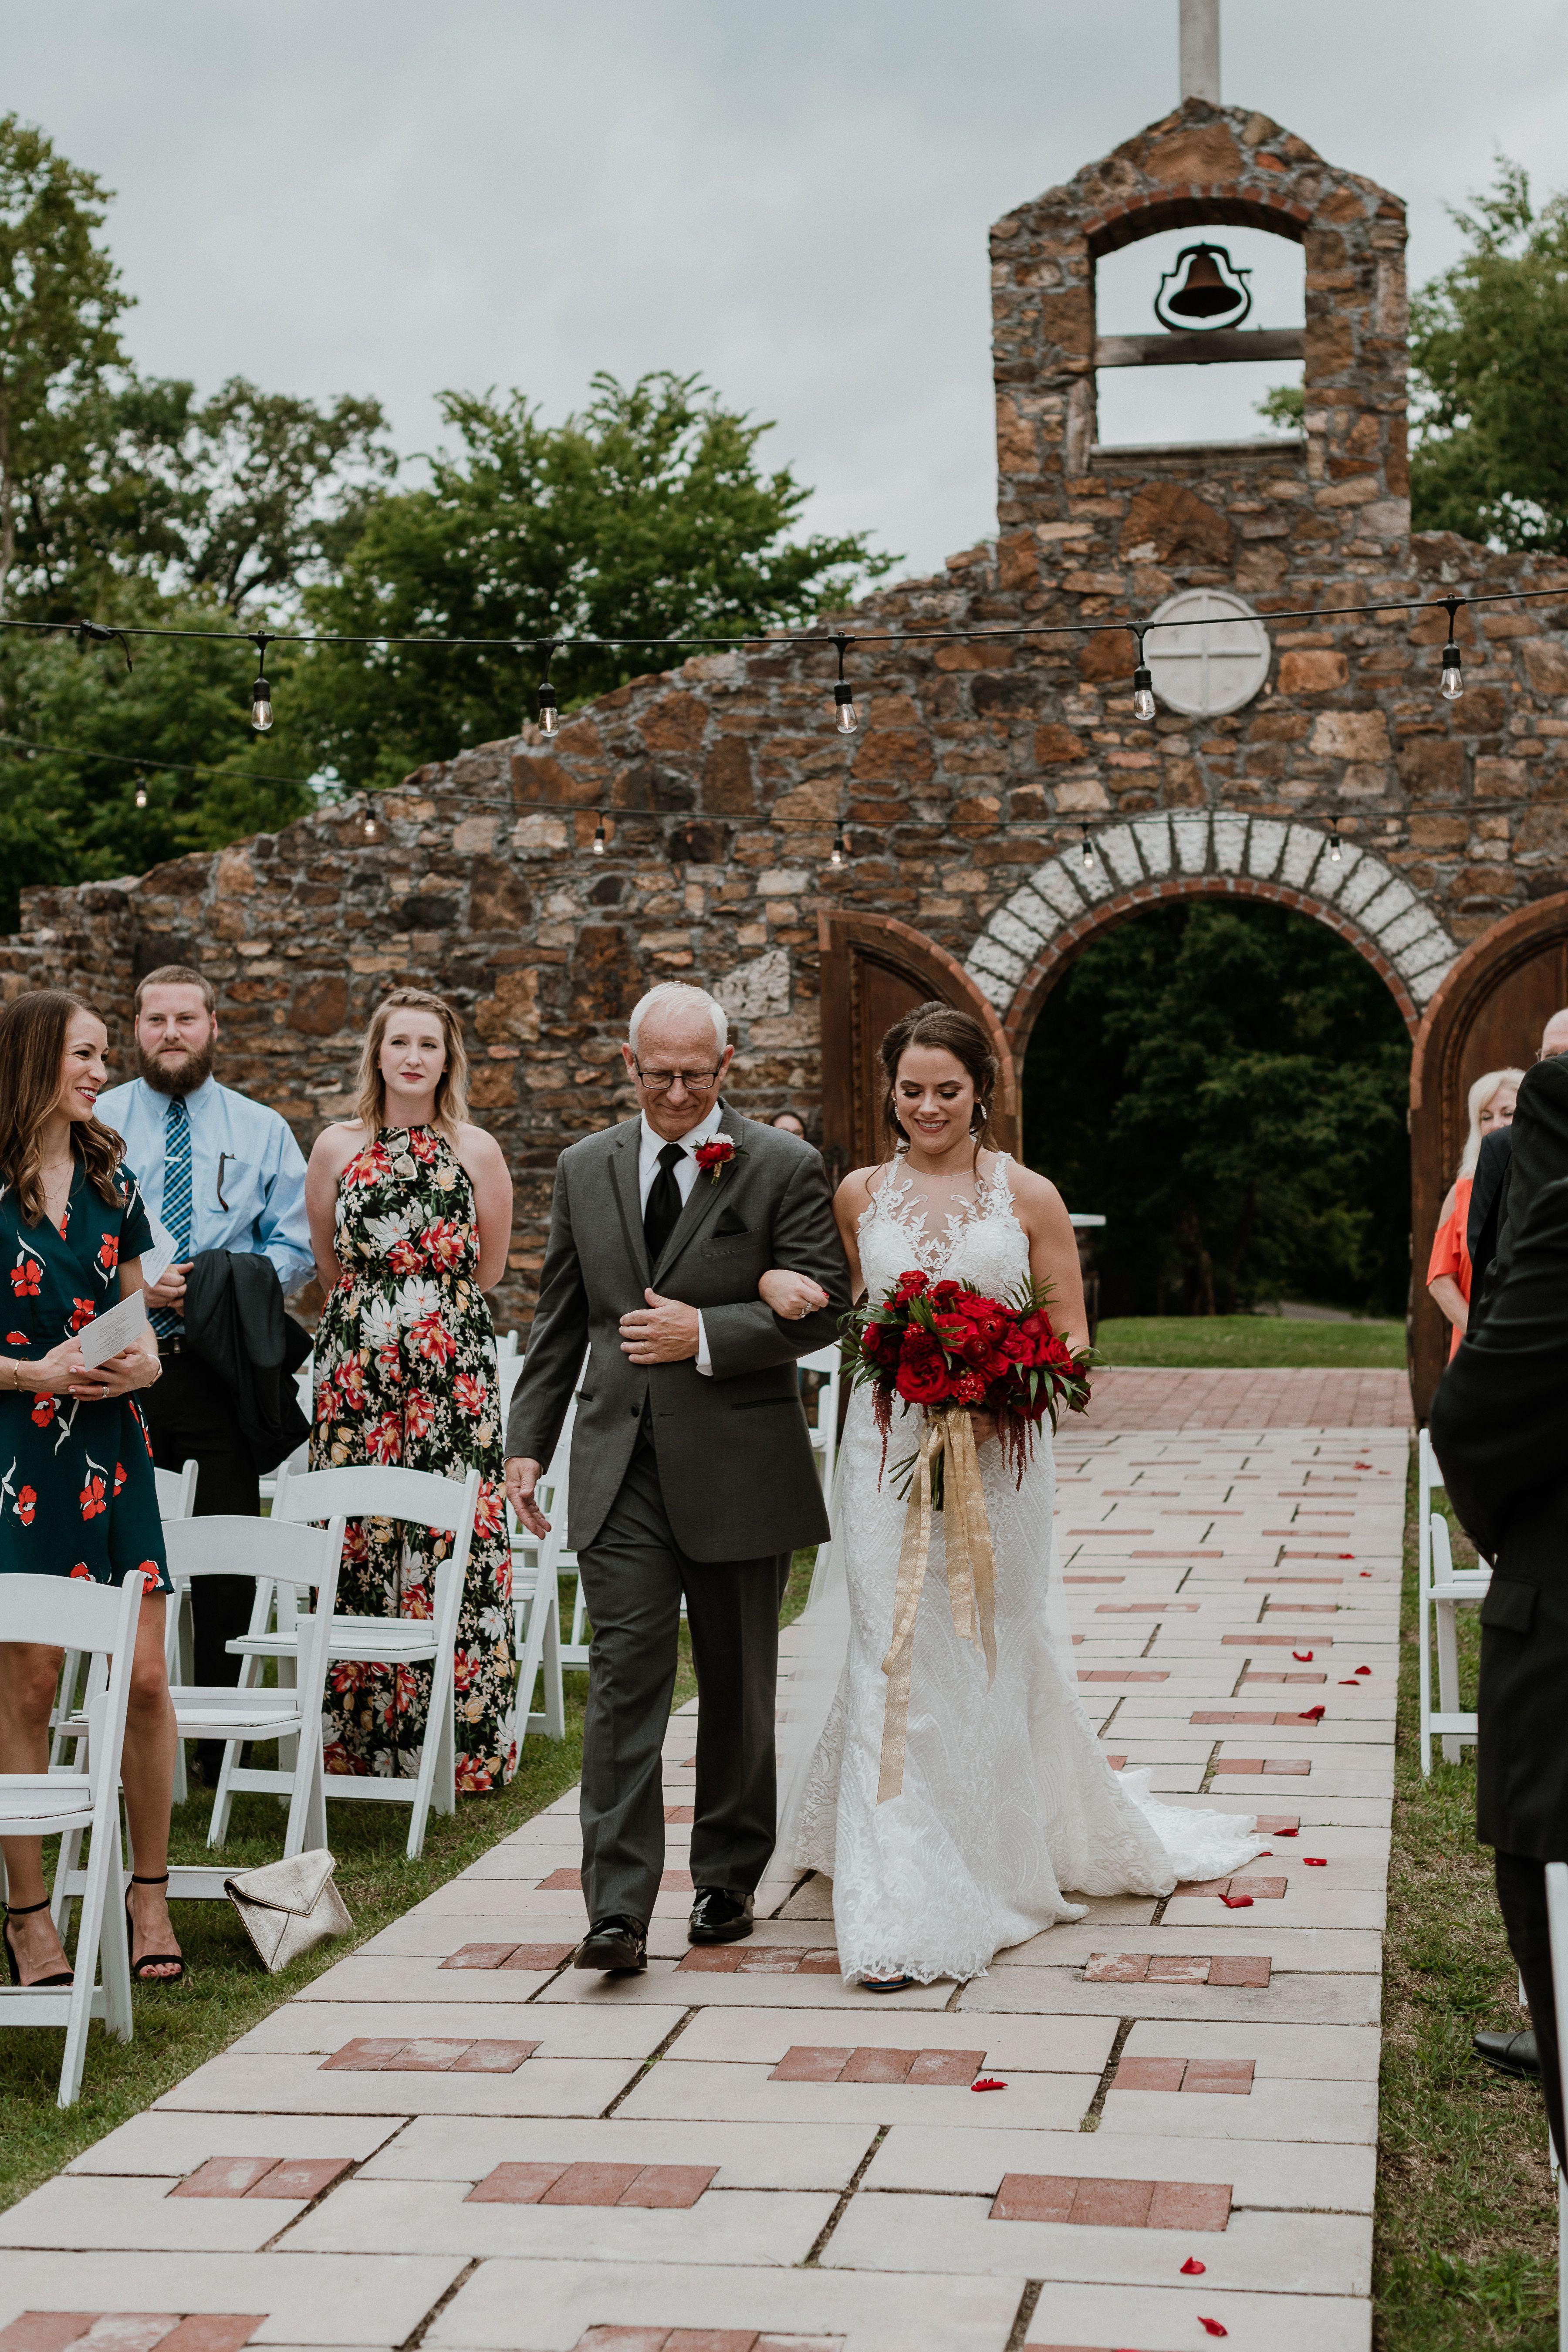 Northwest Arkansas Wedding Venues In 2020 Arkansas Wedding Venues Northwest Arkansas Weddings Arkansas Wedding